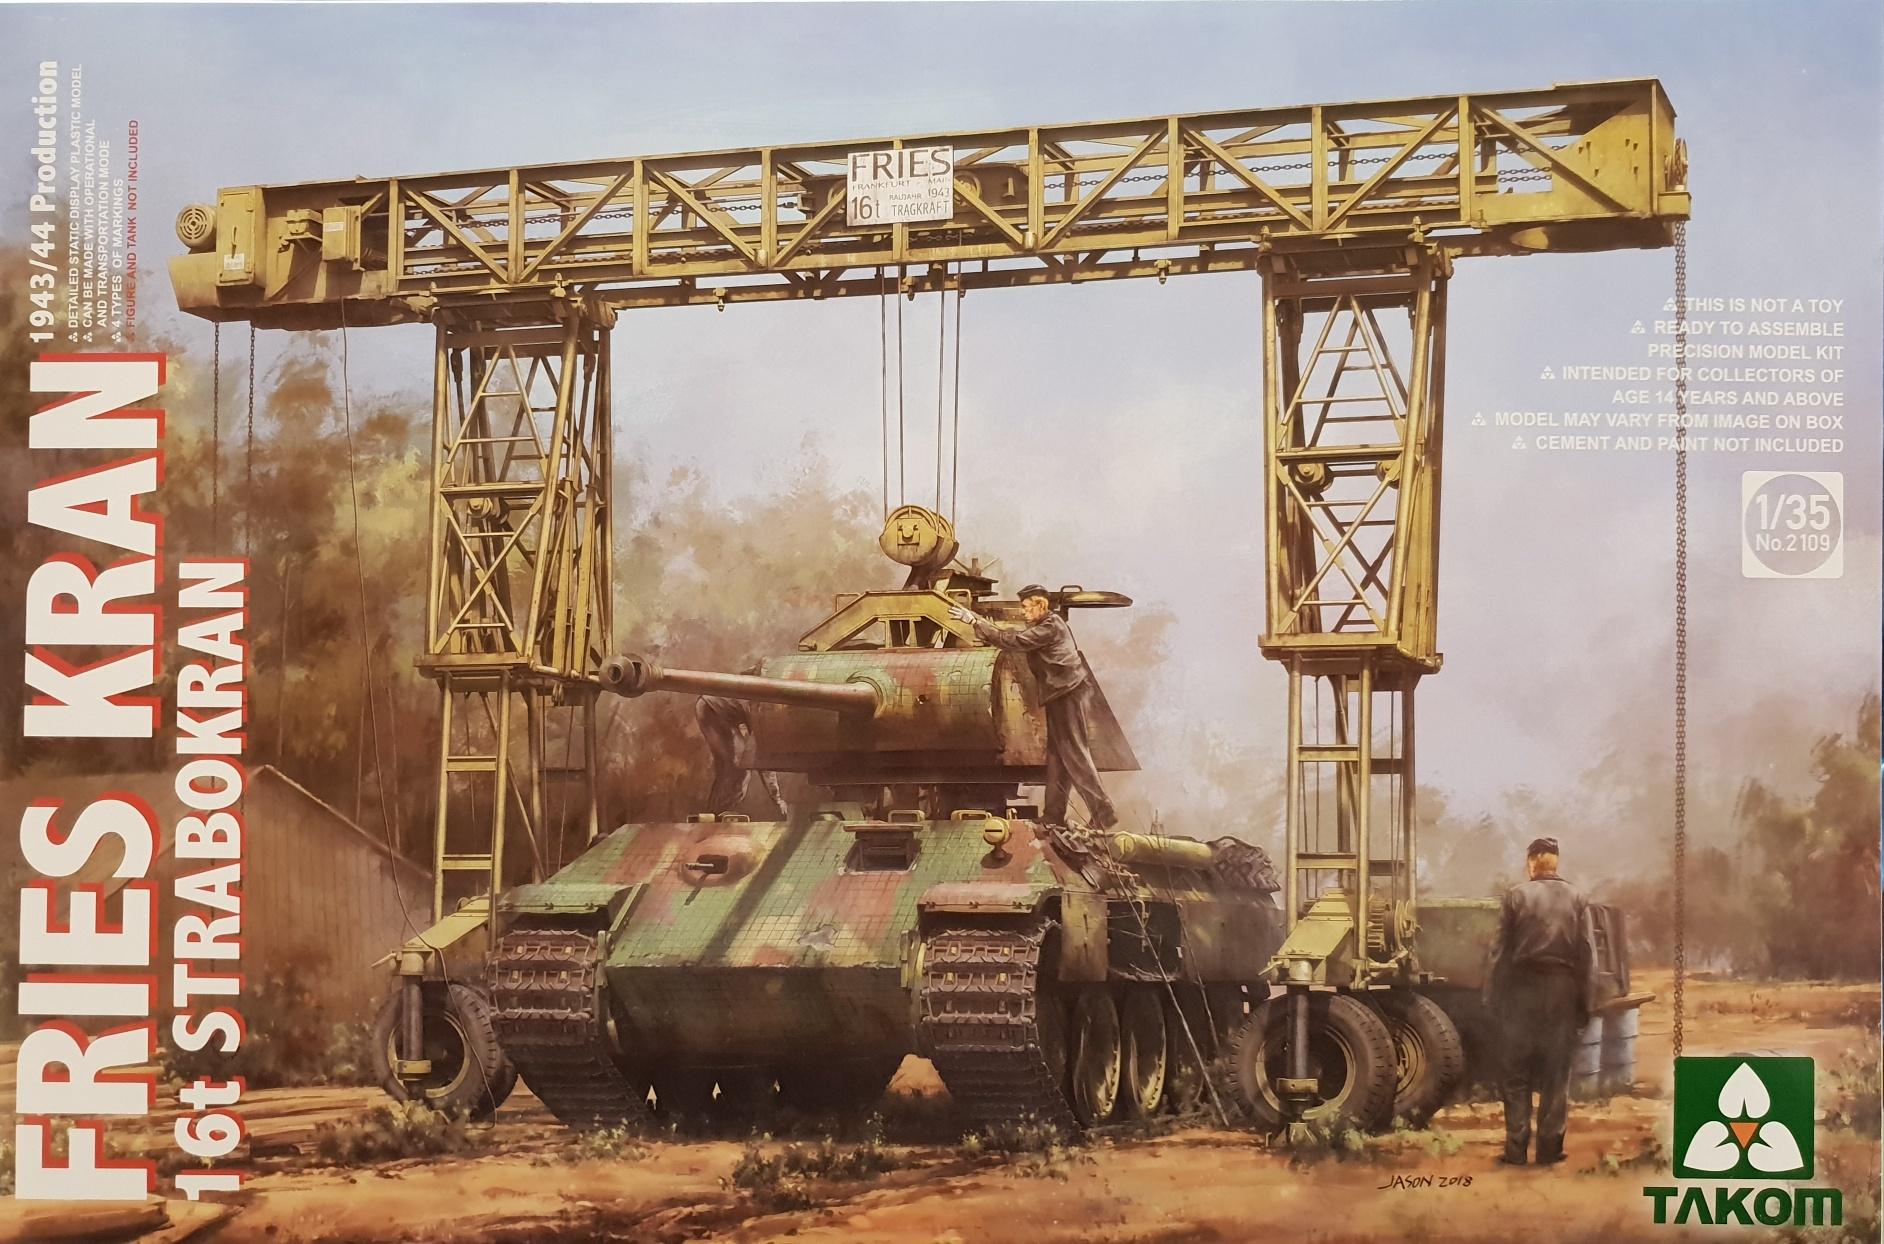 Takom 2109 Fries Kran 16t Strabokran 1943/44 production